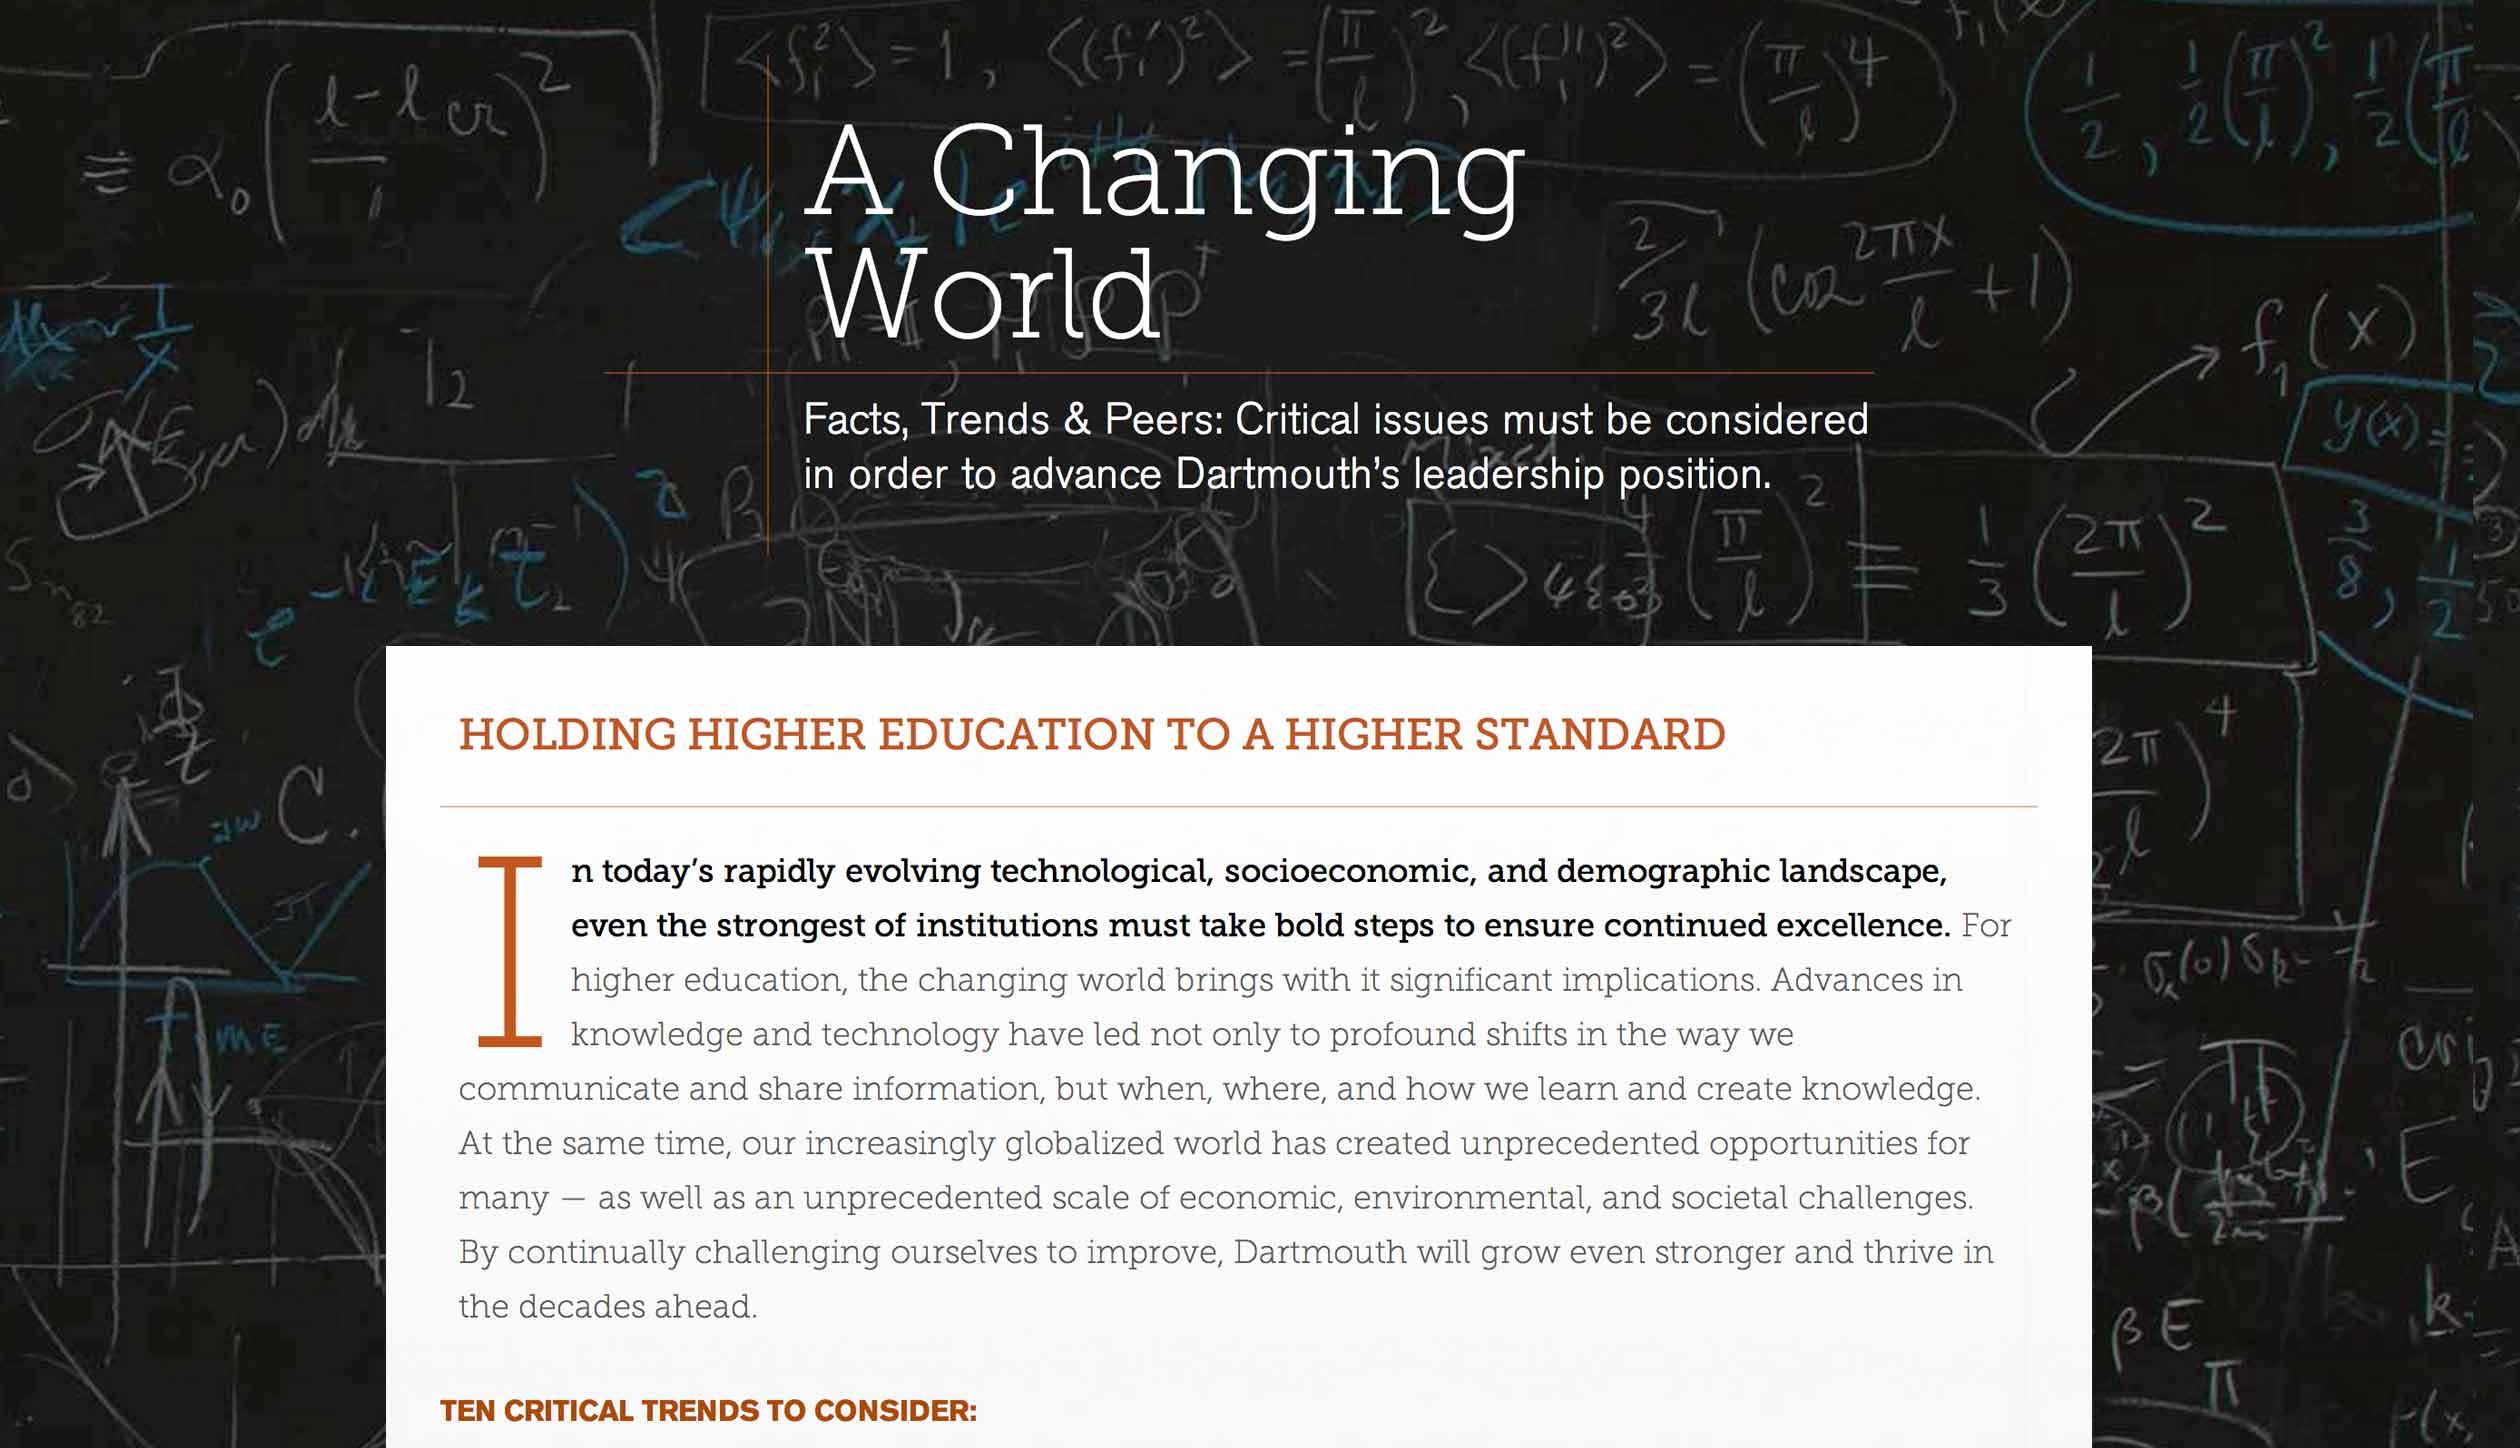 Dartmouth Strategic Planning Changing World